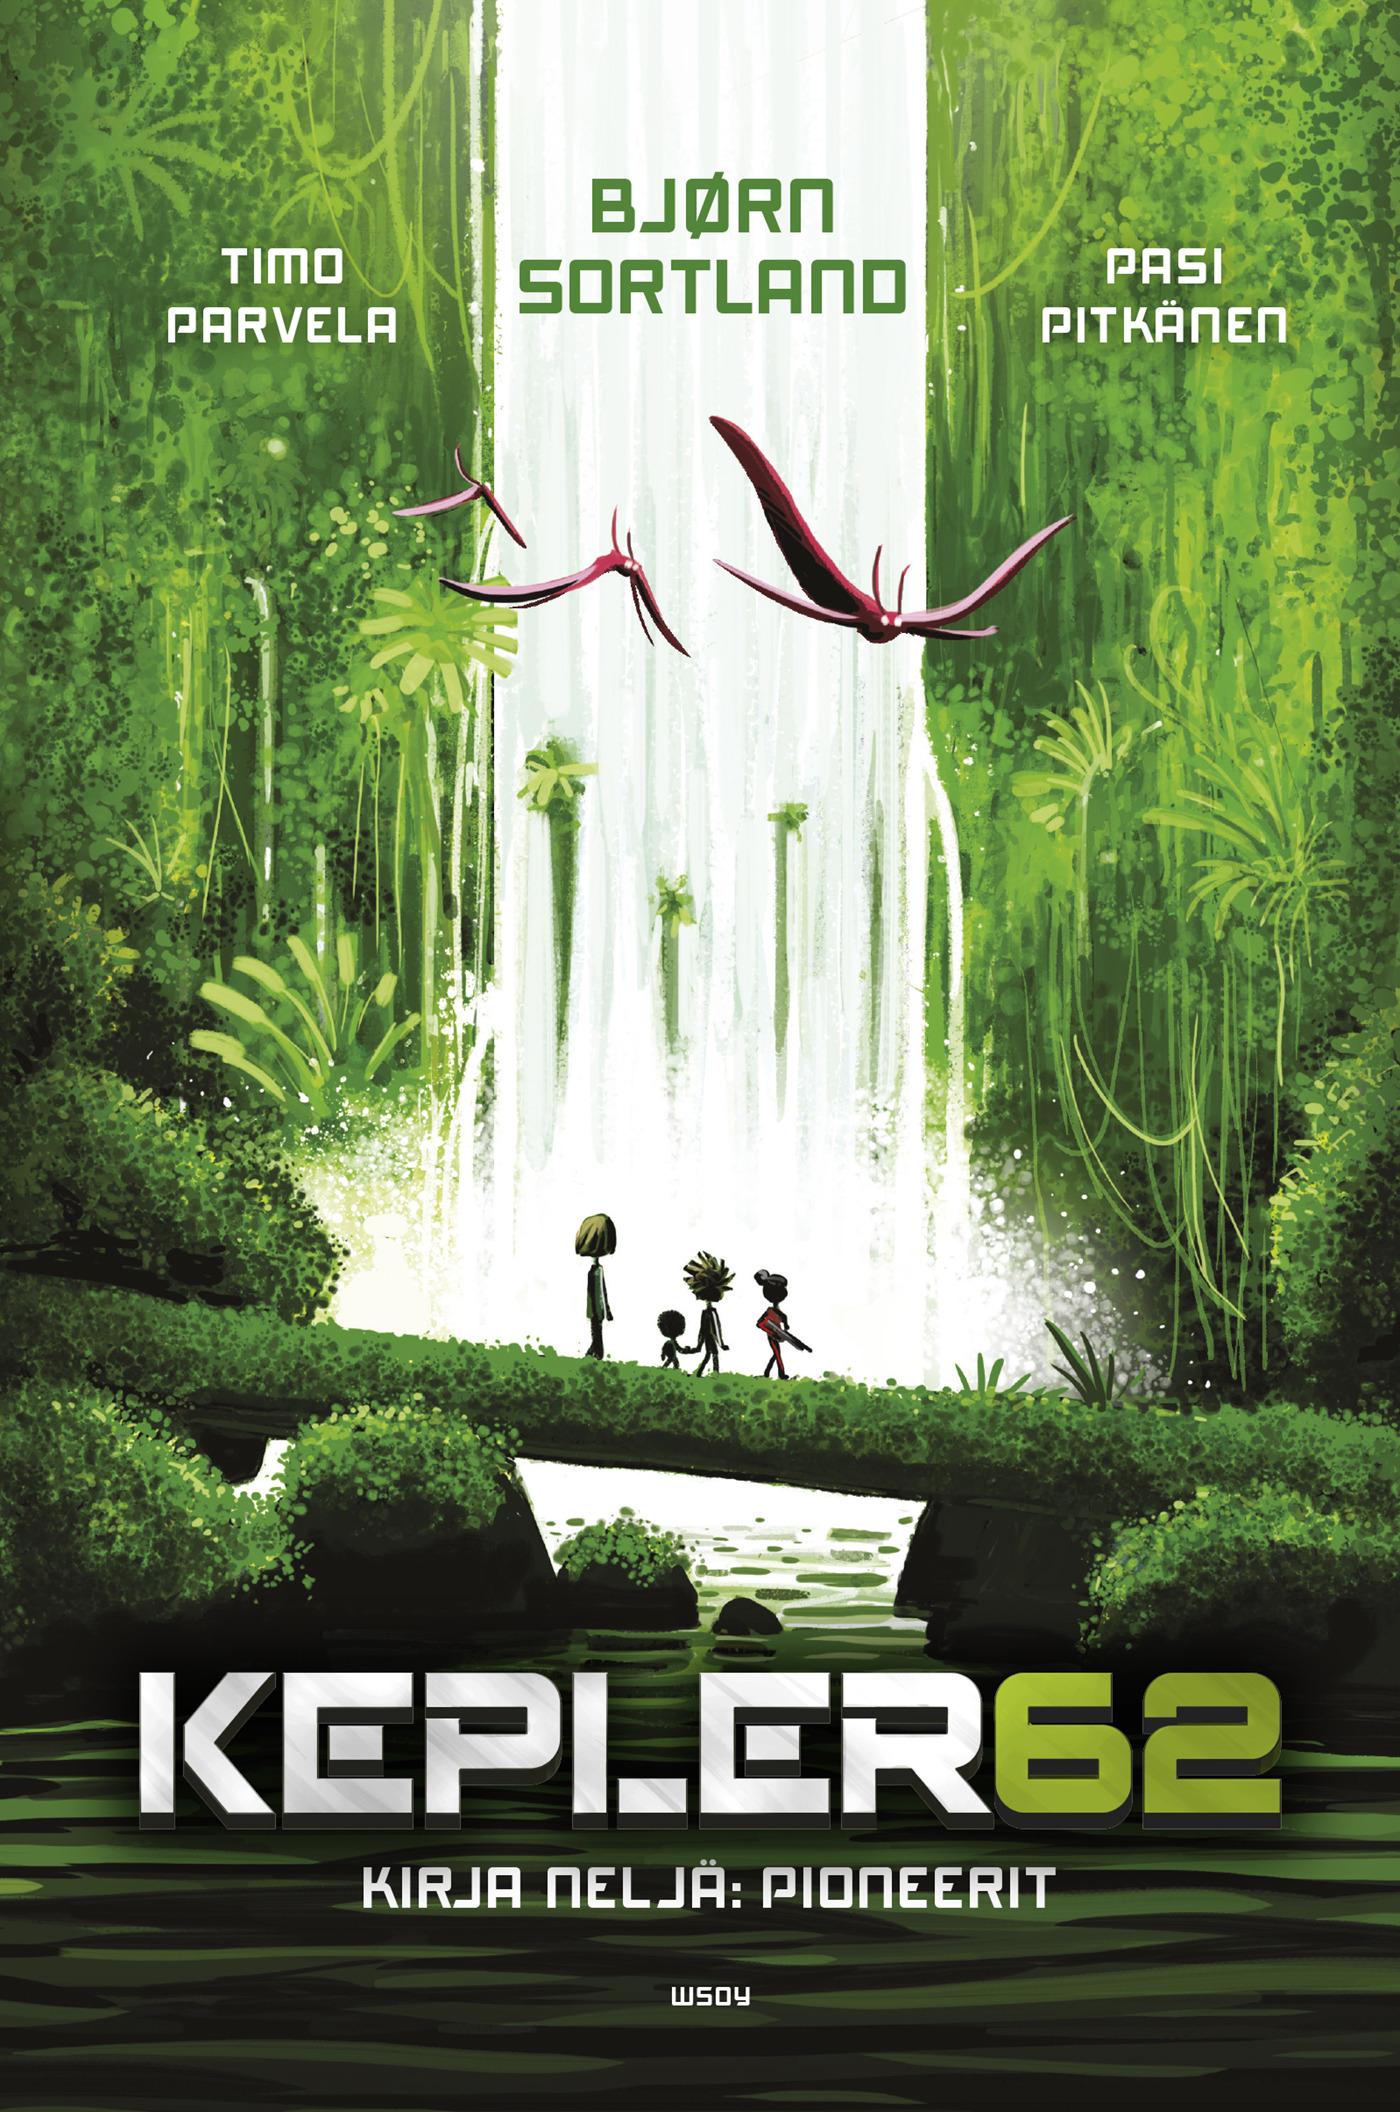 Sortland, Bjørn - Kepler62 Kirja neljä: Pioneerit, e-kirja